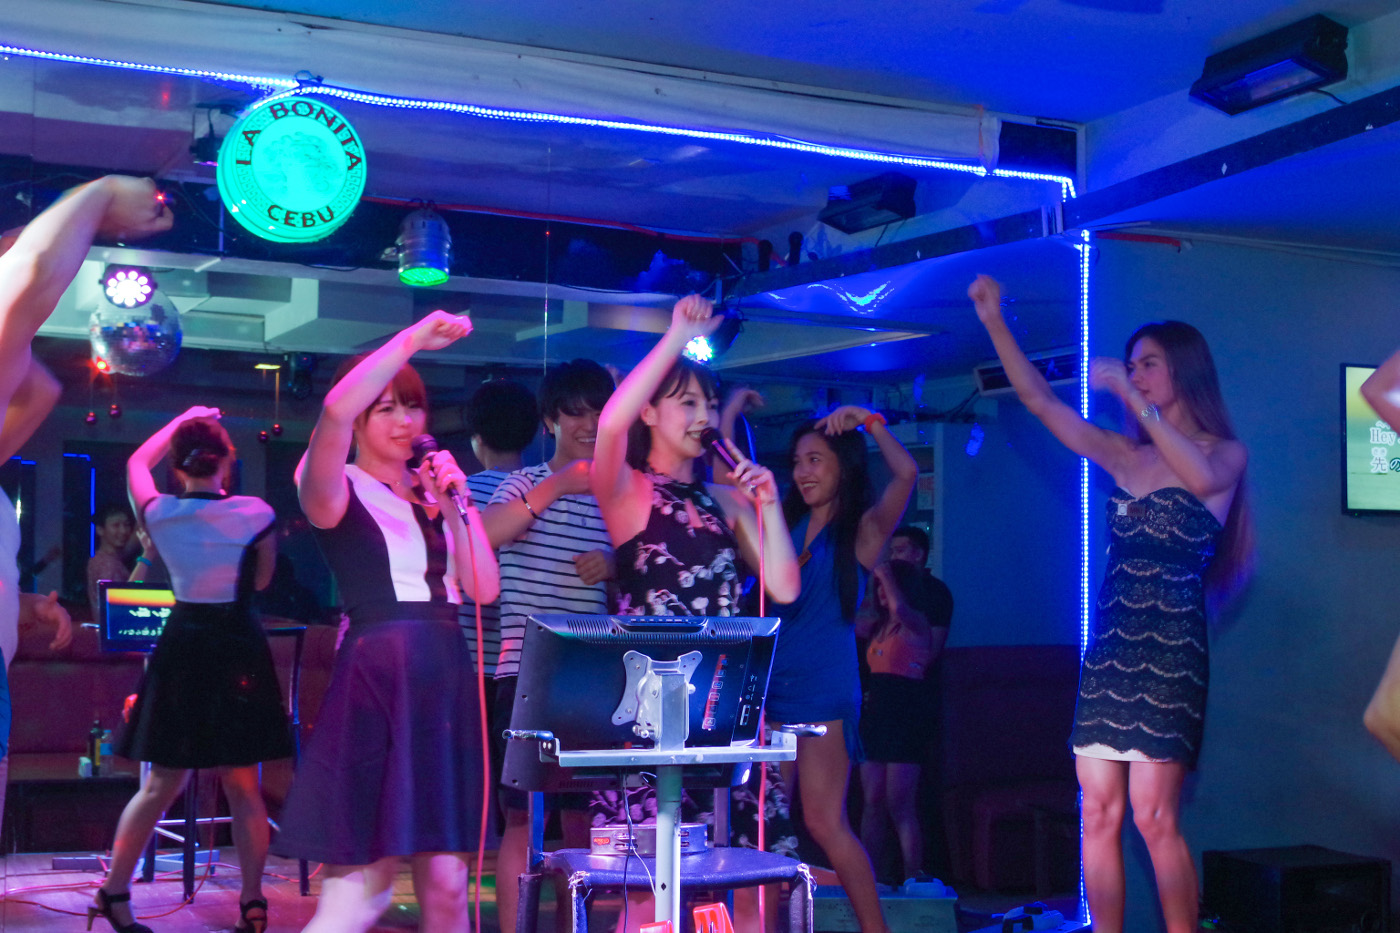 KTVで踊る女性2人